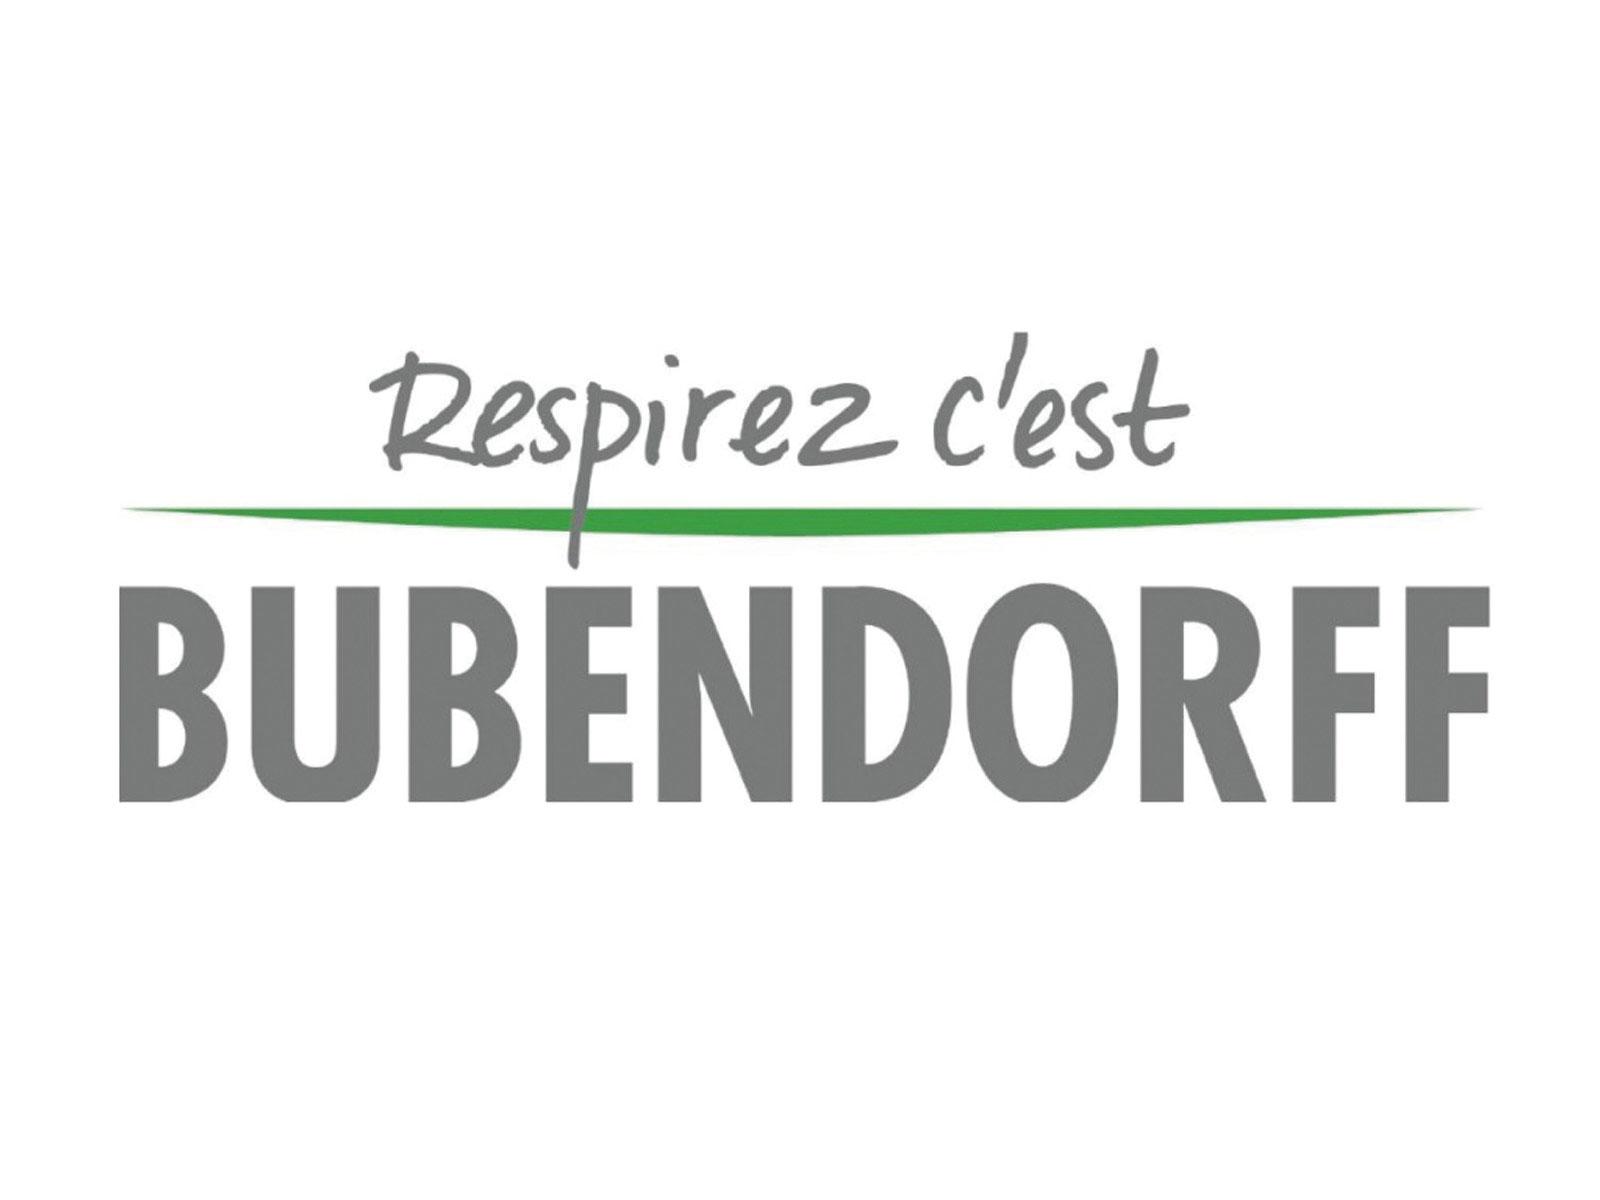 logo bubendorff volet roulant veranda